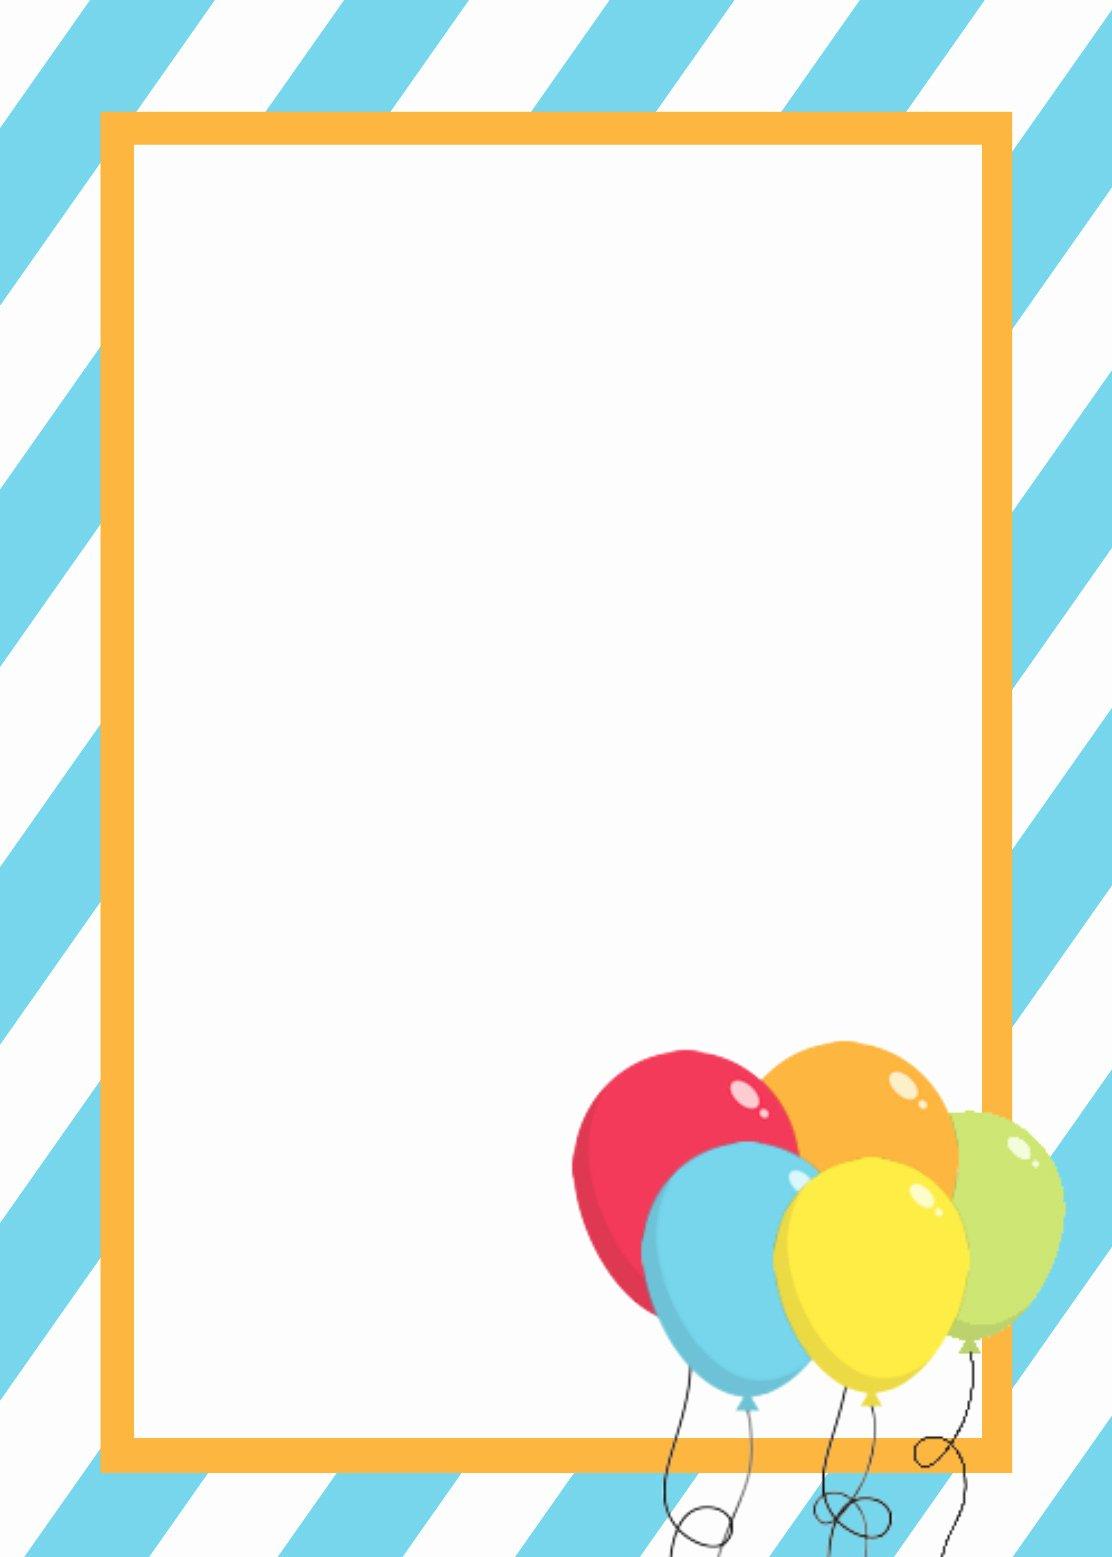 First Birthday Invitation Template Free Elegant Free Printable Birthday Invitation Templates